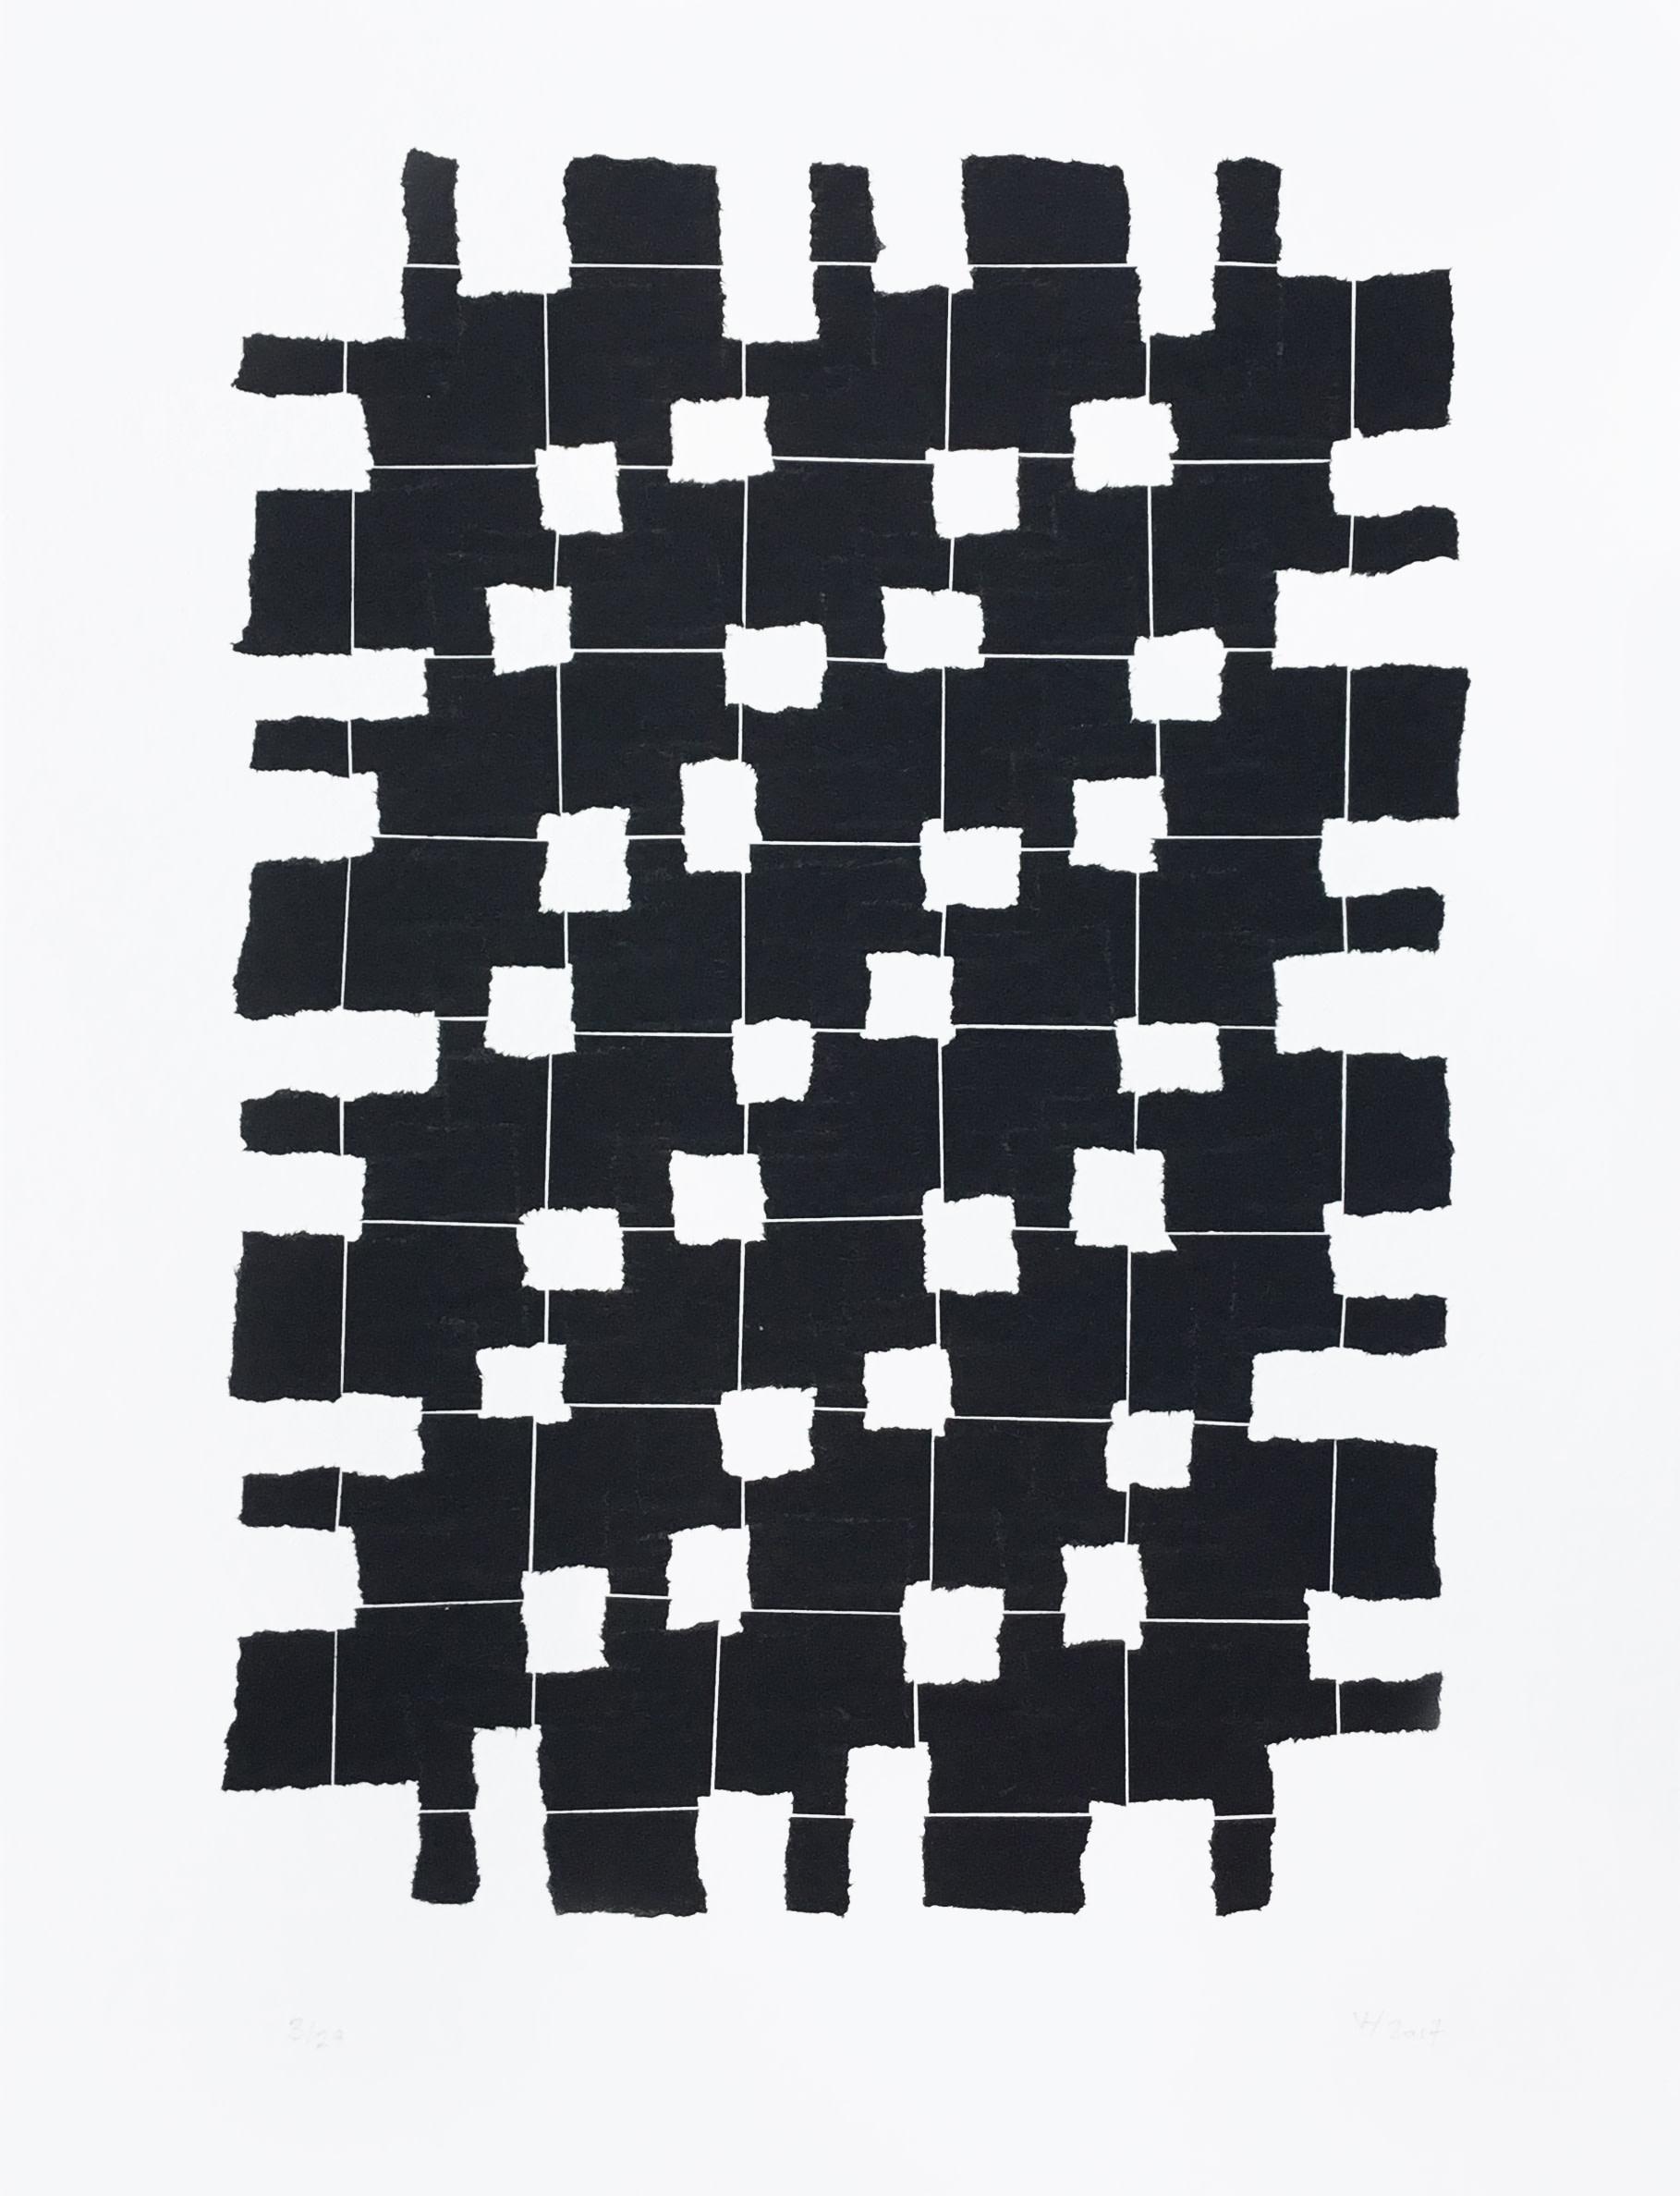 Veronica Herber, 8x5 Black Mod, 2017 | The Central